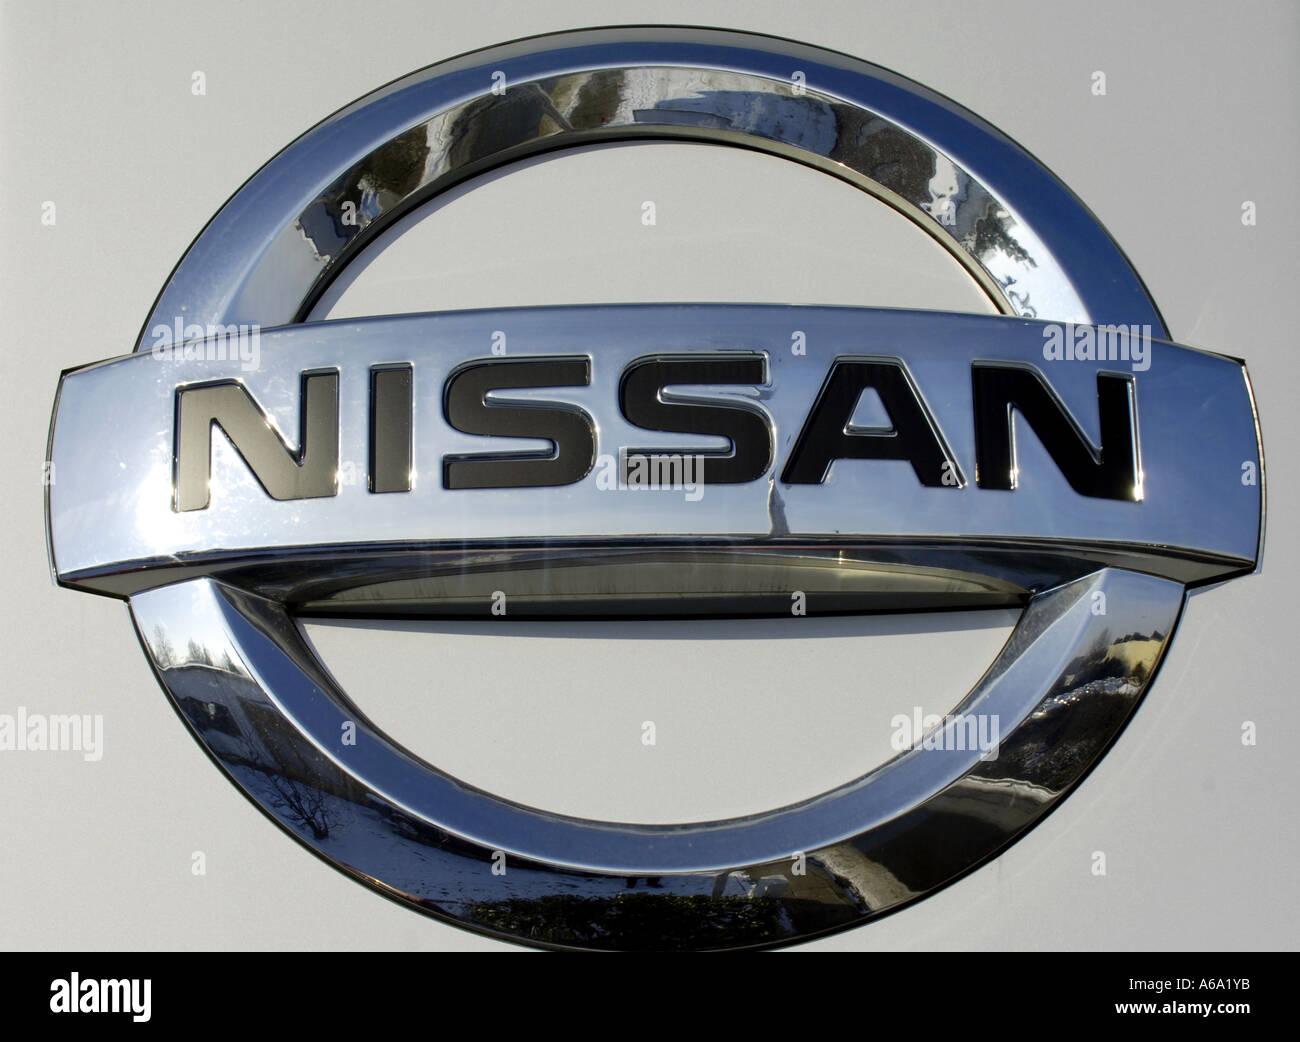 nissan japan japanese car manufacturer company asian asia ...